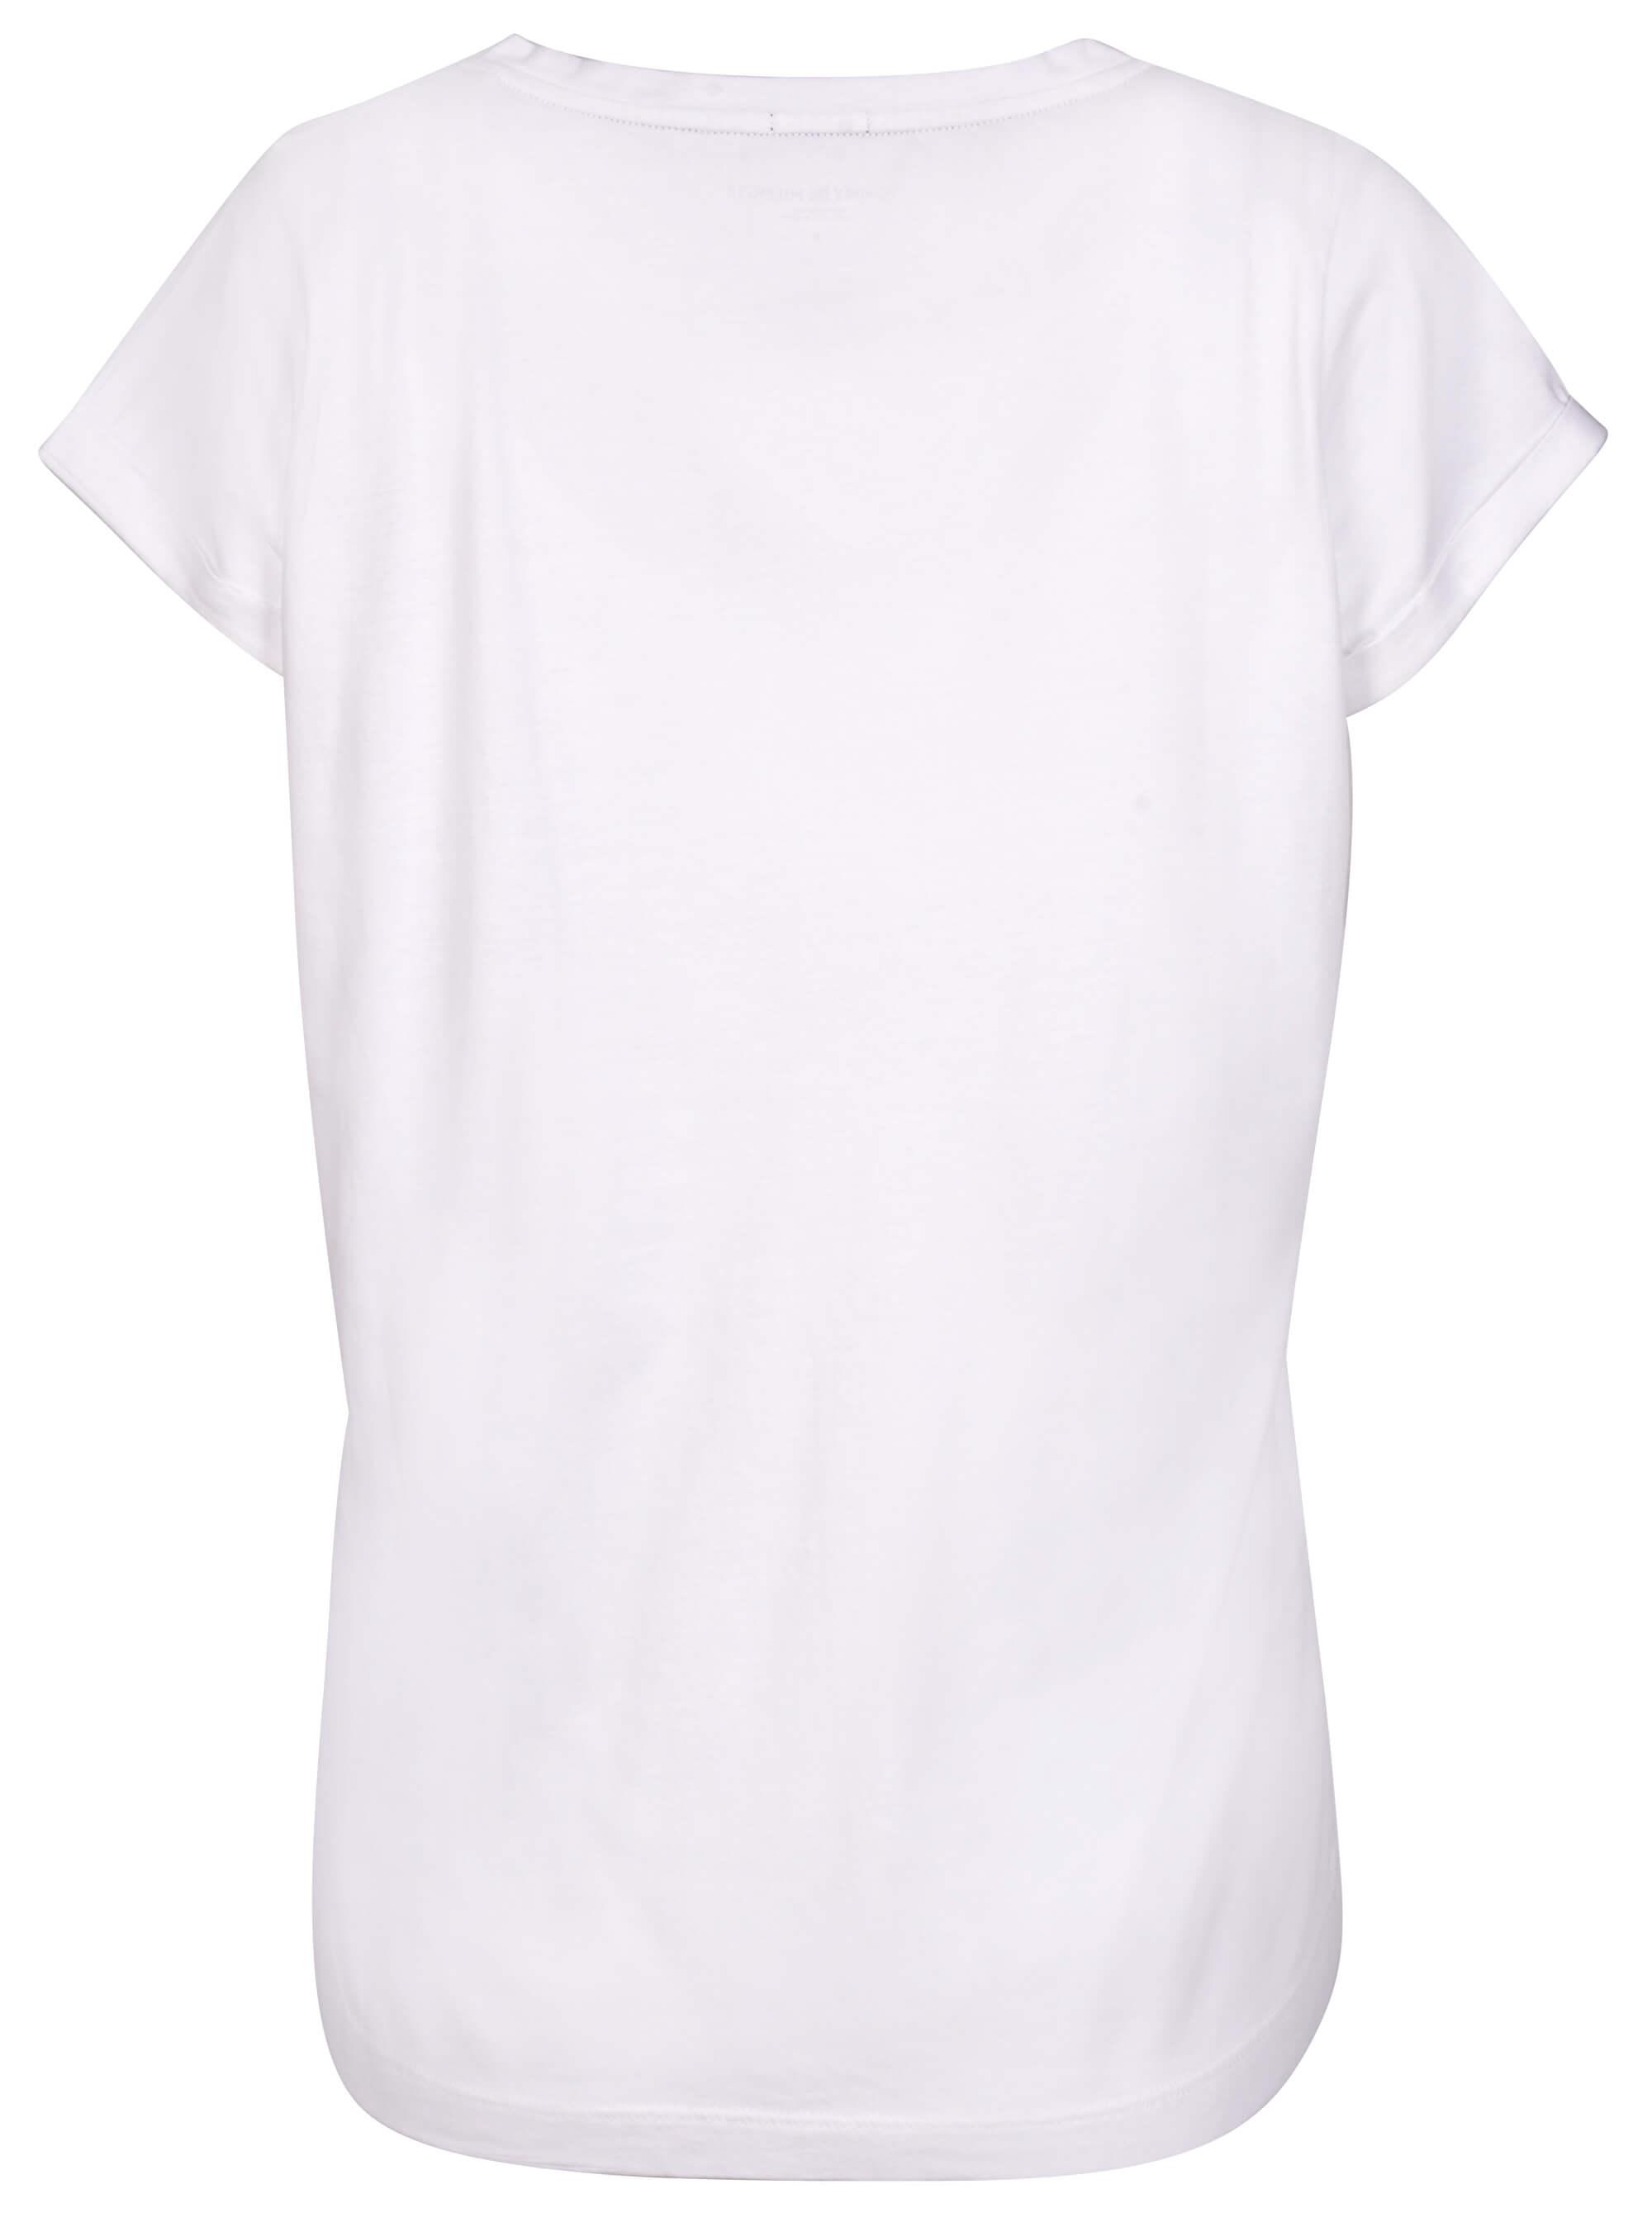 144b837bdf1 Tommy Hilfiger Dámské triko Vn Tee Ss White UW0UW00676-100 ...